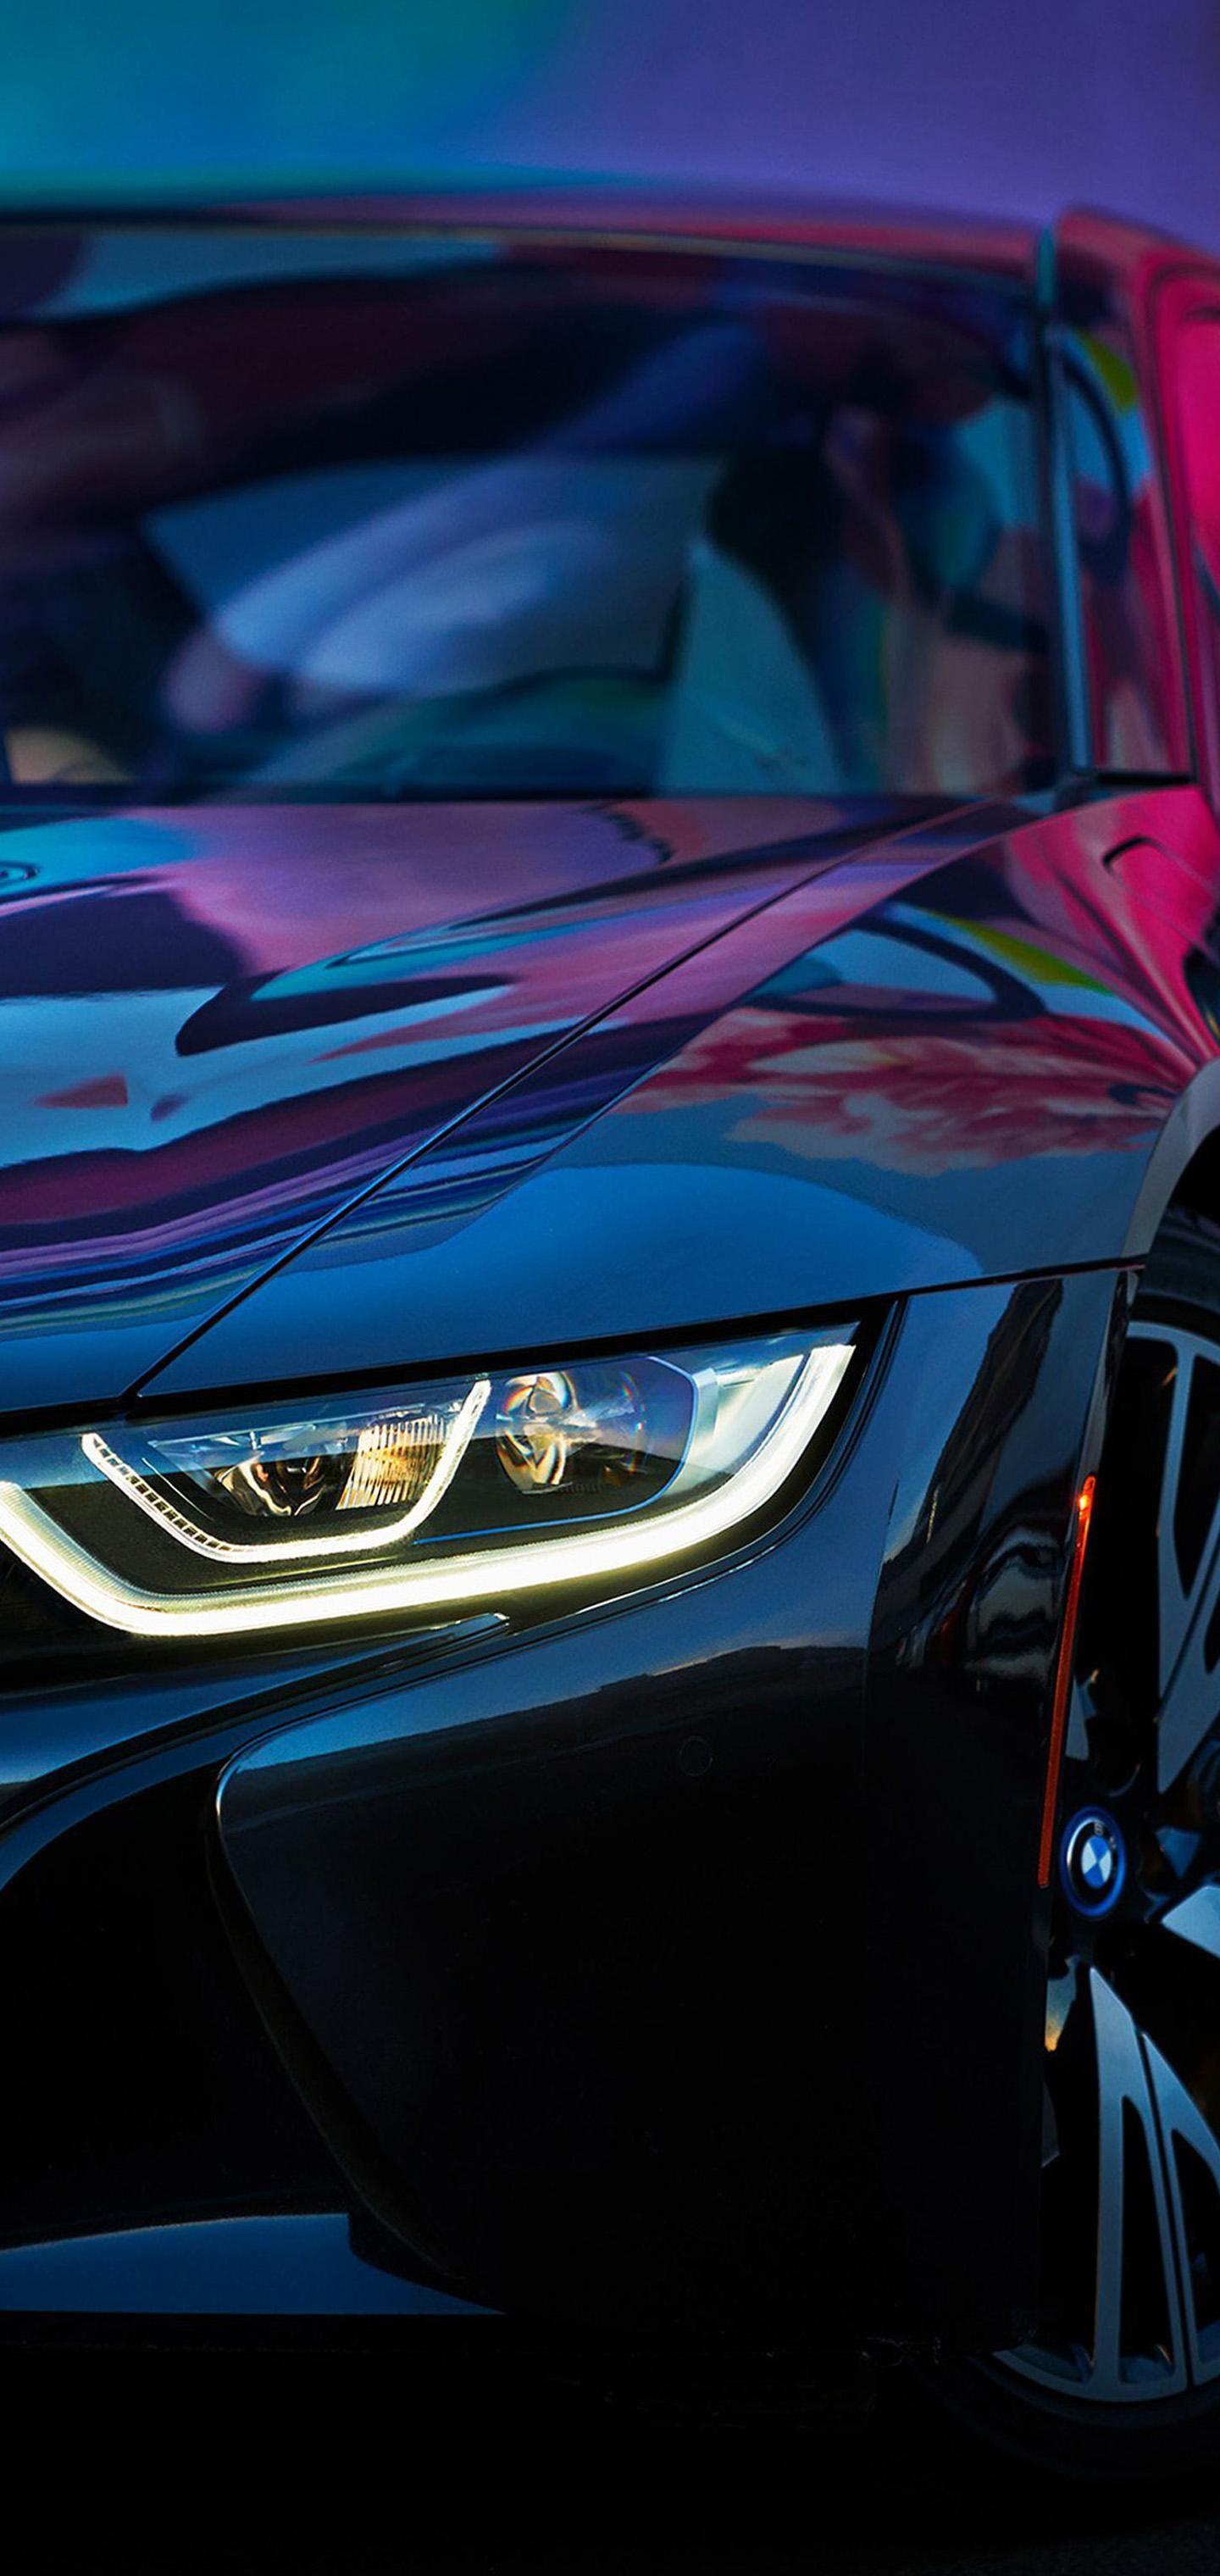 Samsung S10 Wallpaper Car Ipcwallpapers Iphone Wallpaper Luxury Bmw Wallpapers Purple Car